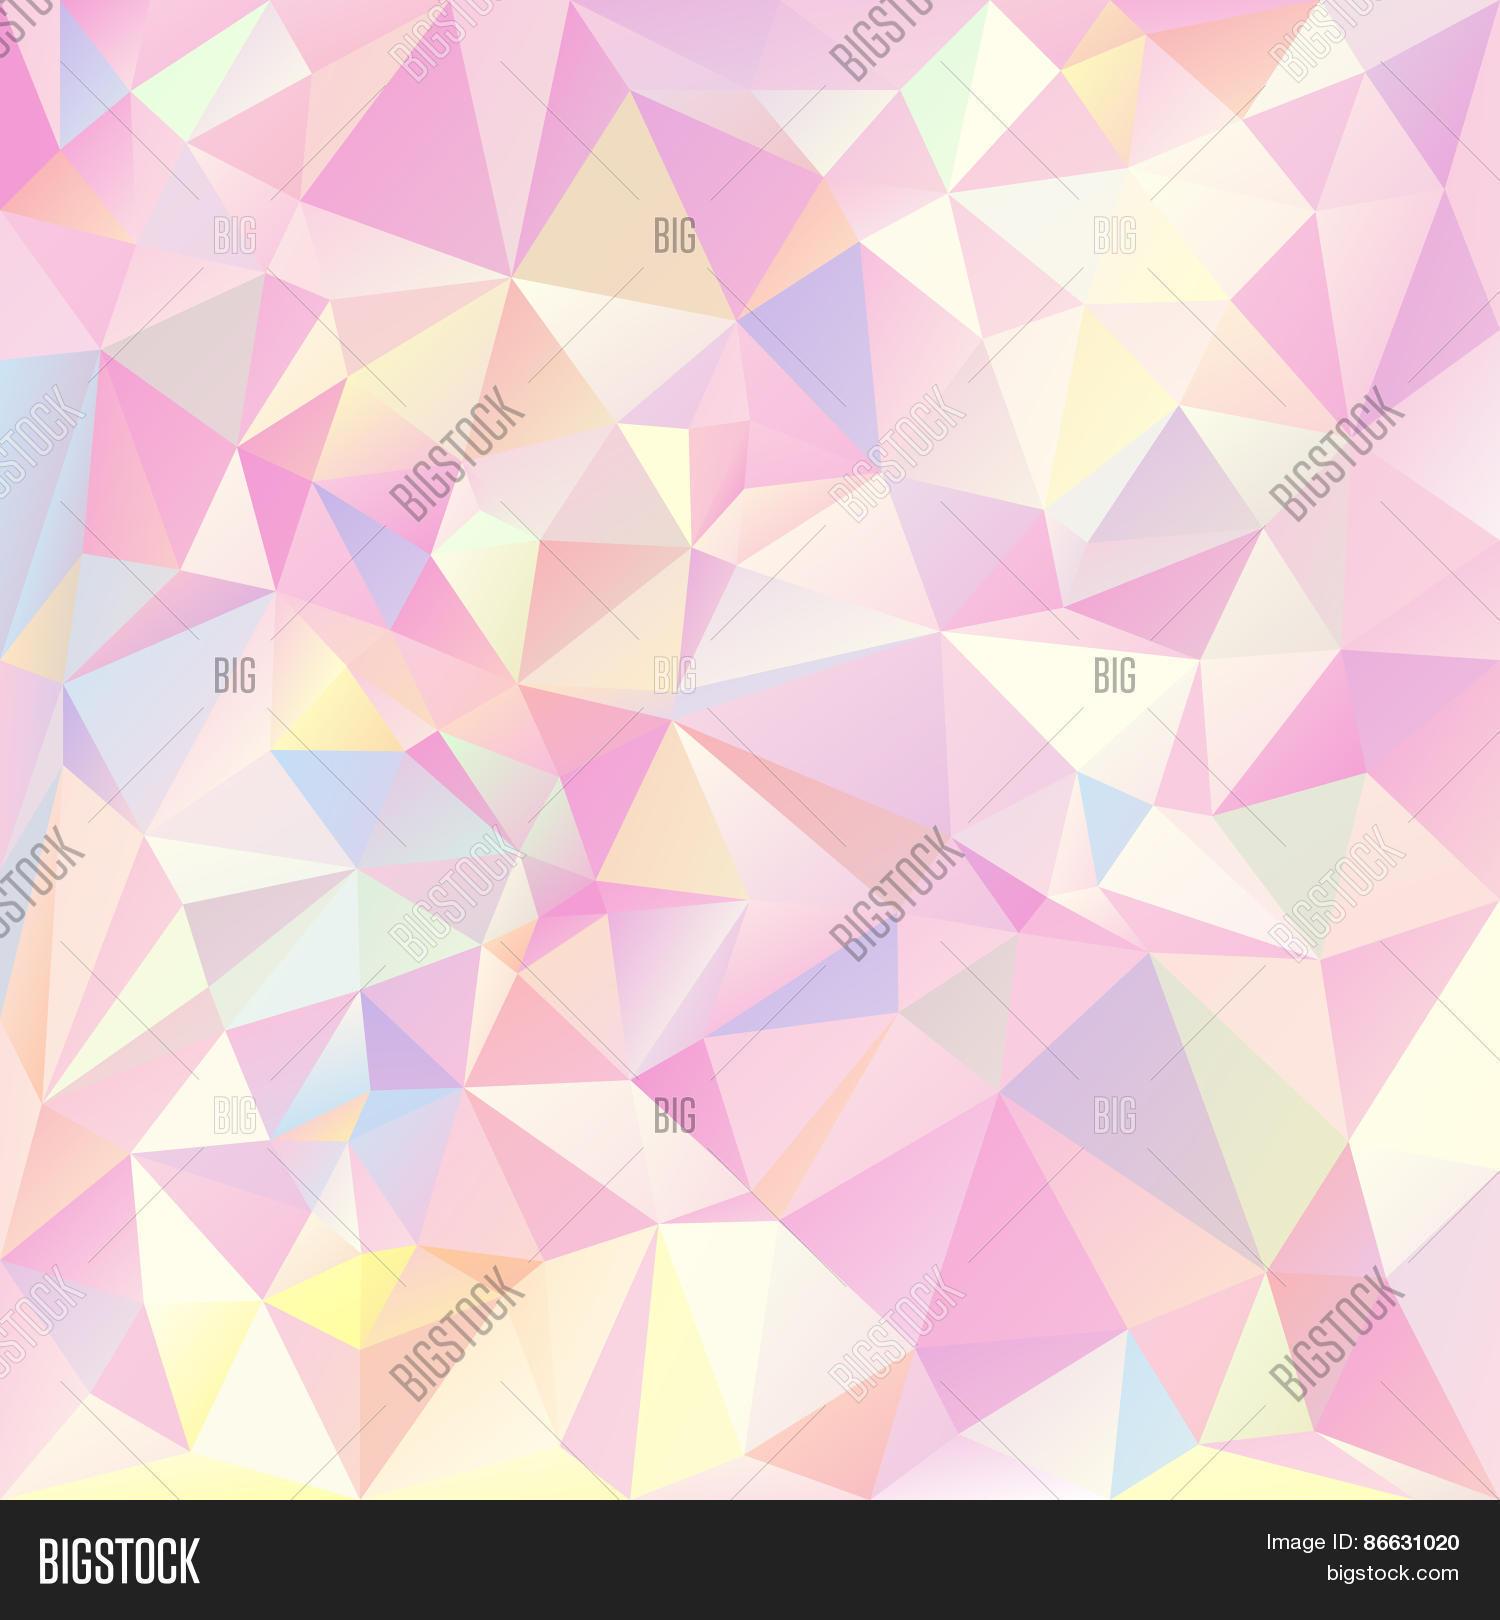 Vector Polygonal Background Vector & Photo | Bigstock